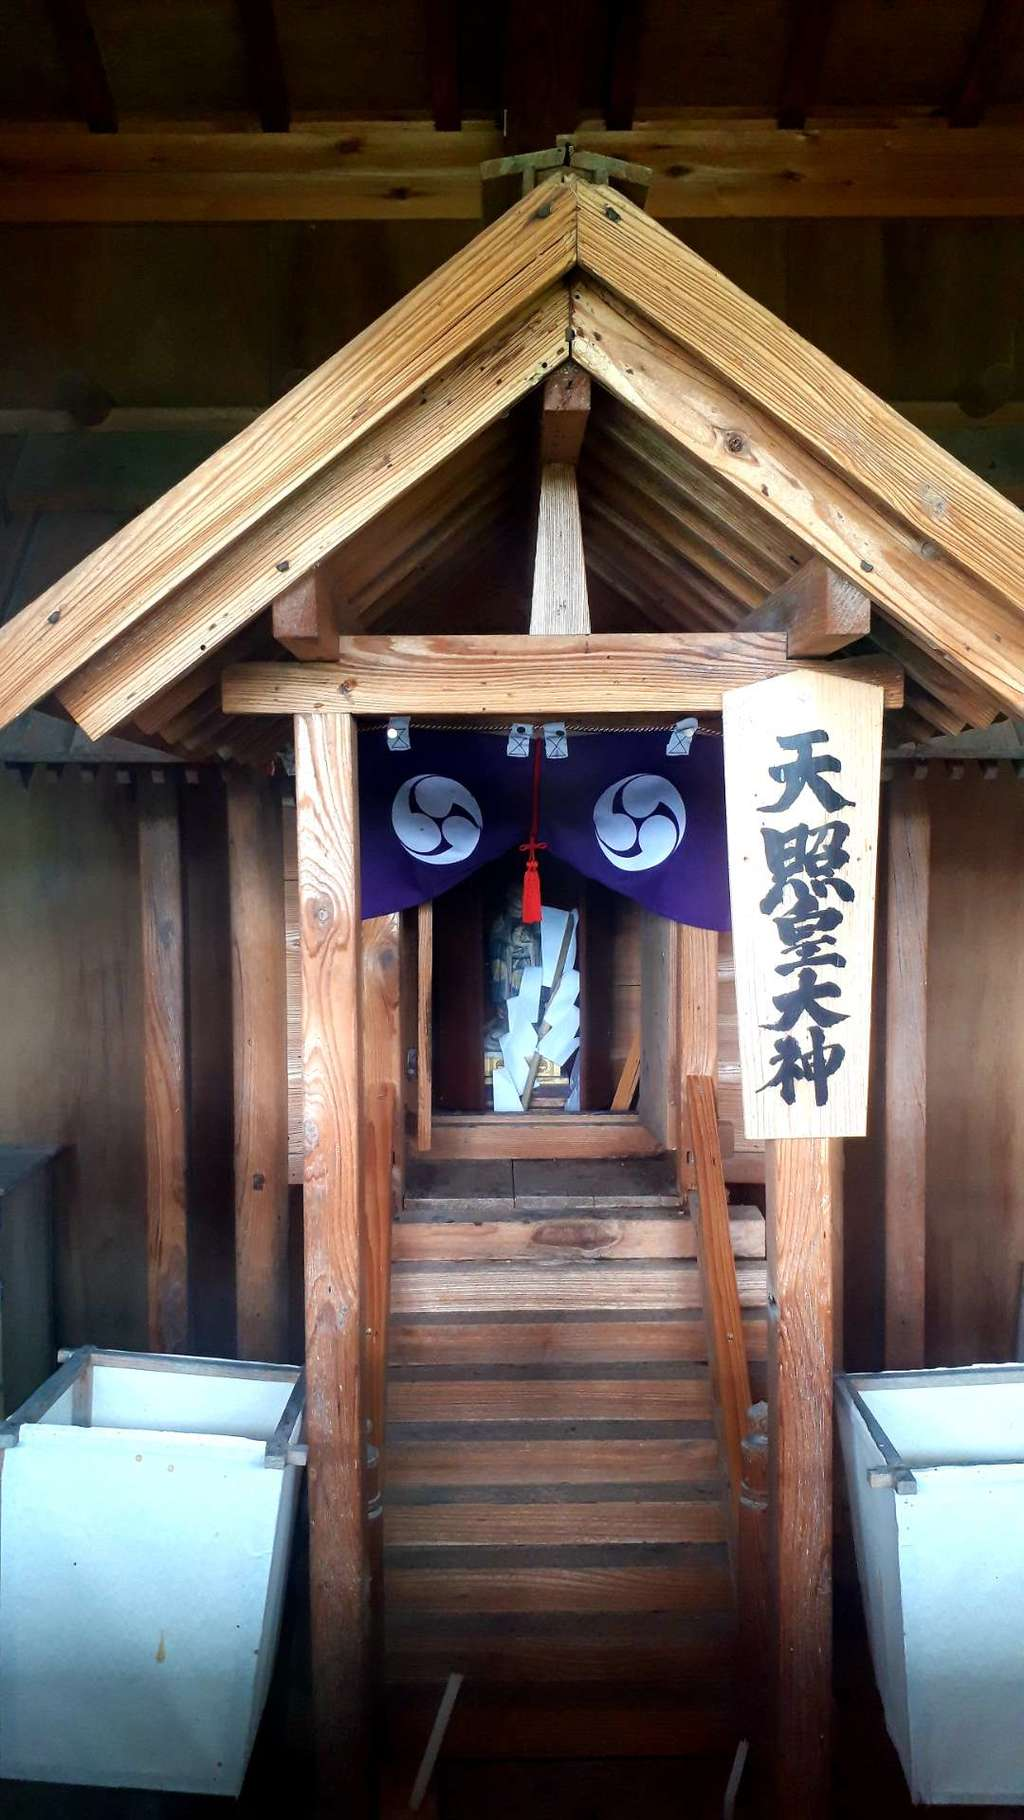 天照御祖神社の本殿